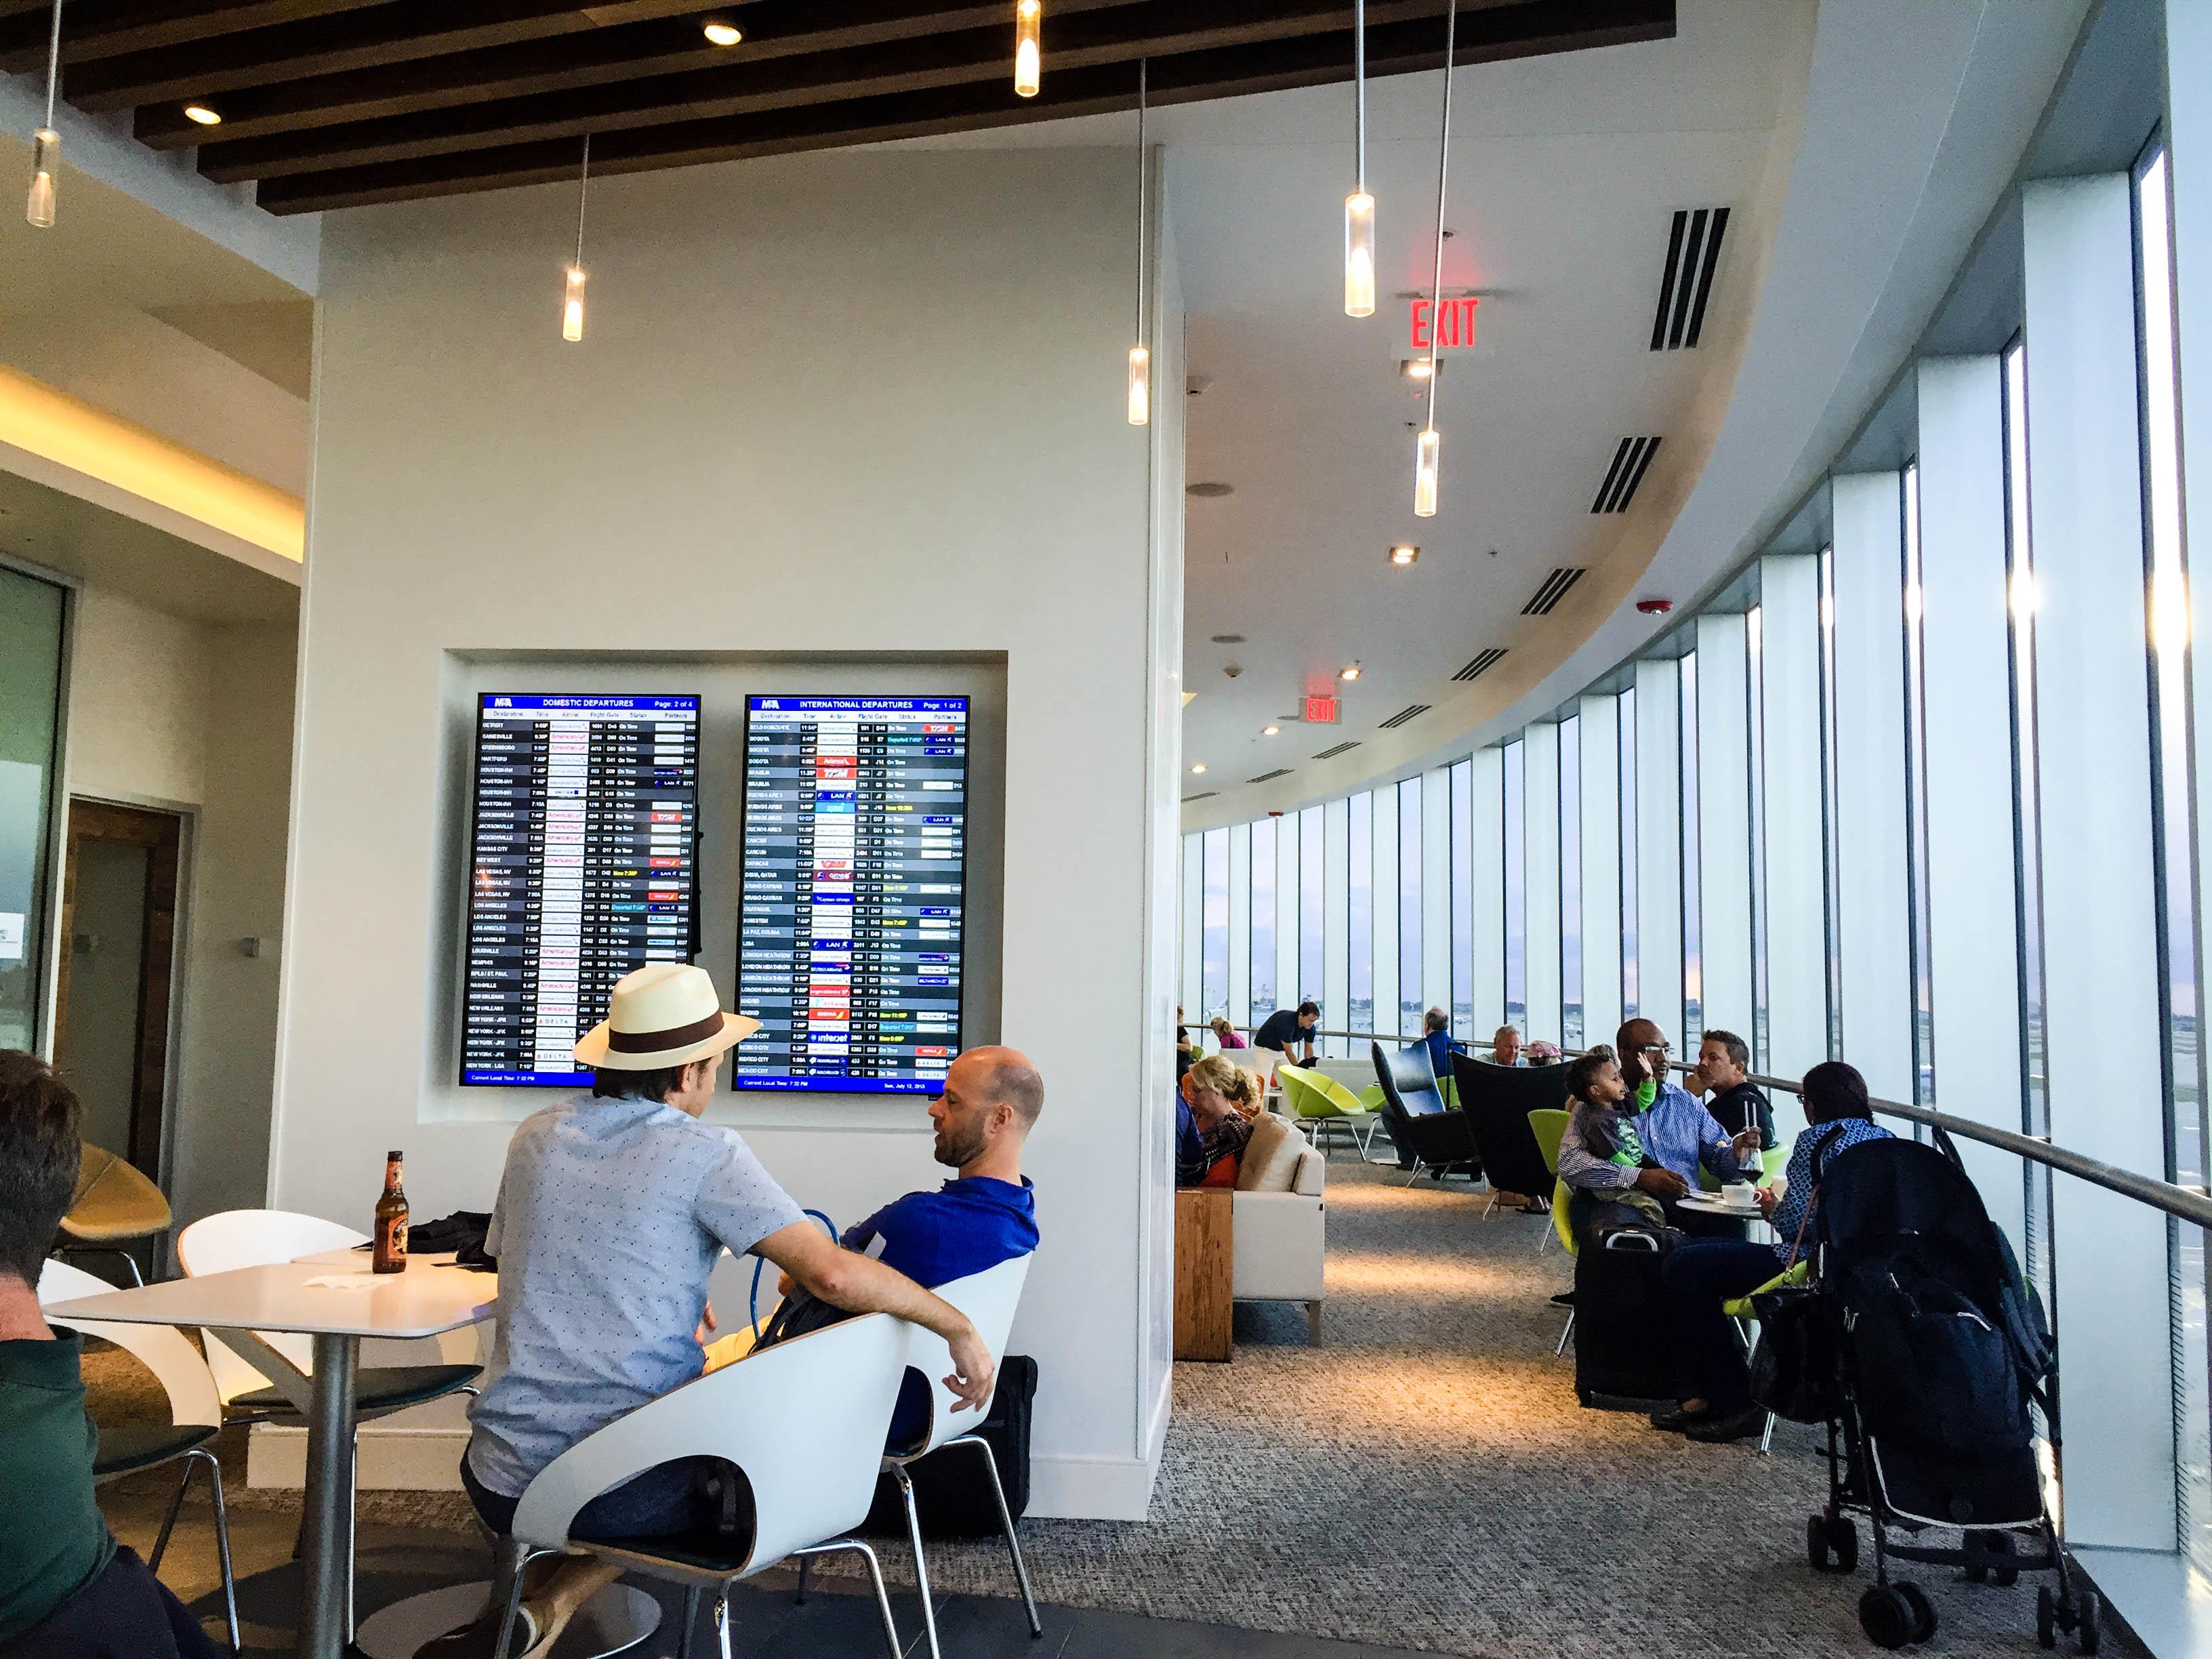 Centurion Lounge at MIA Airport